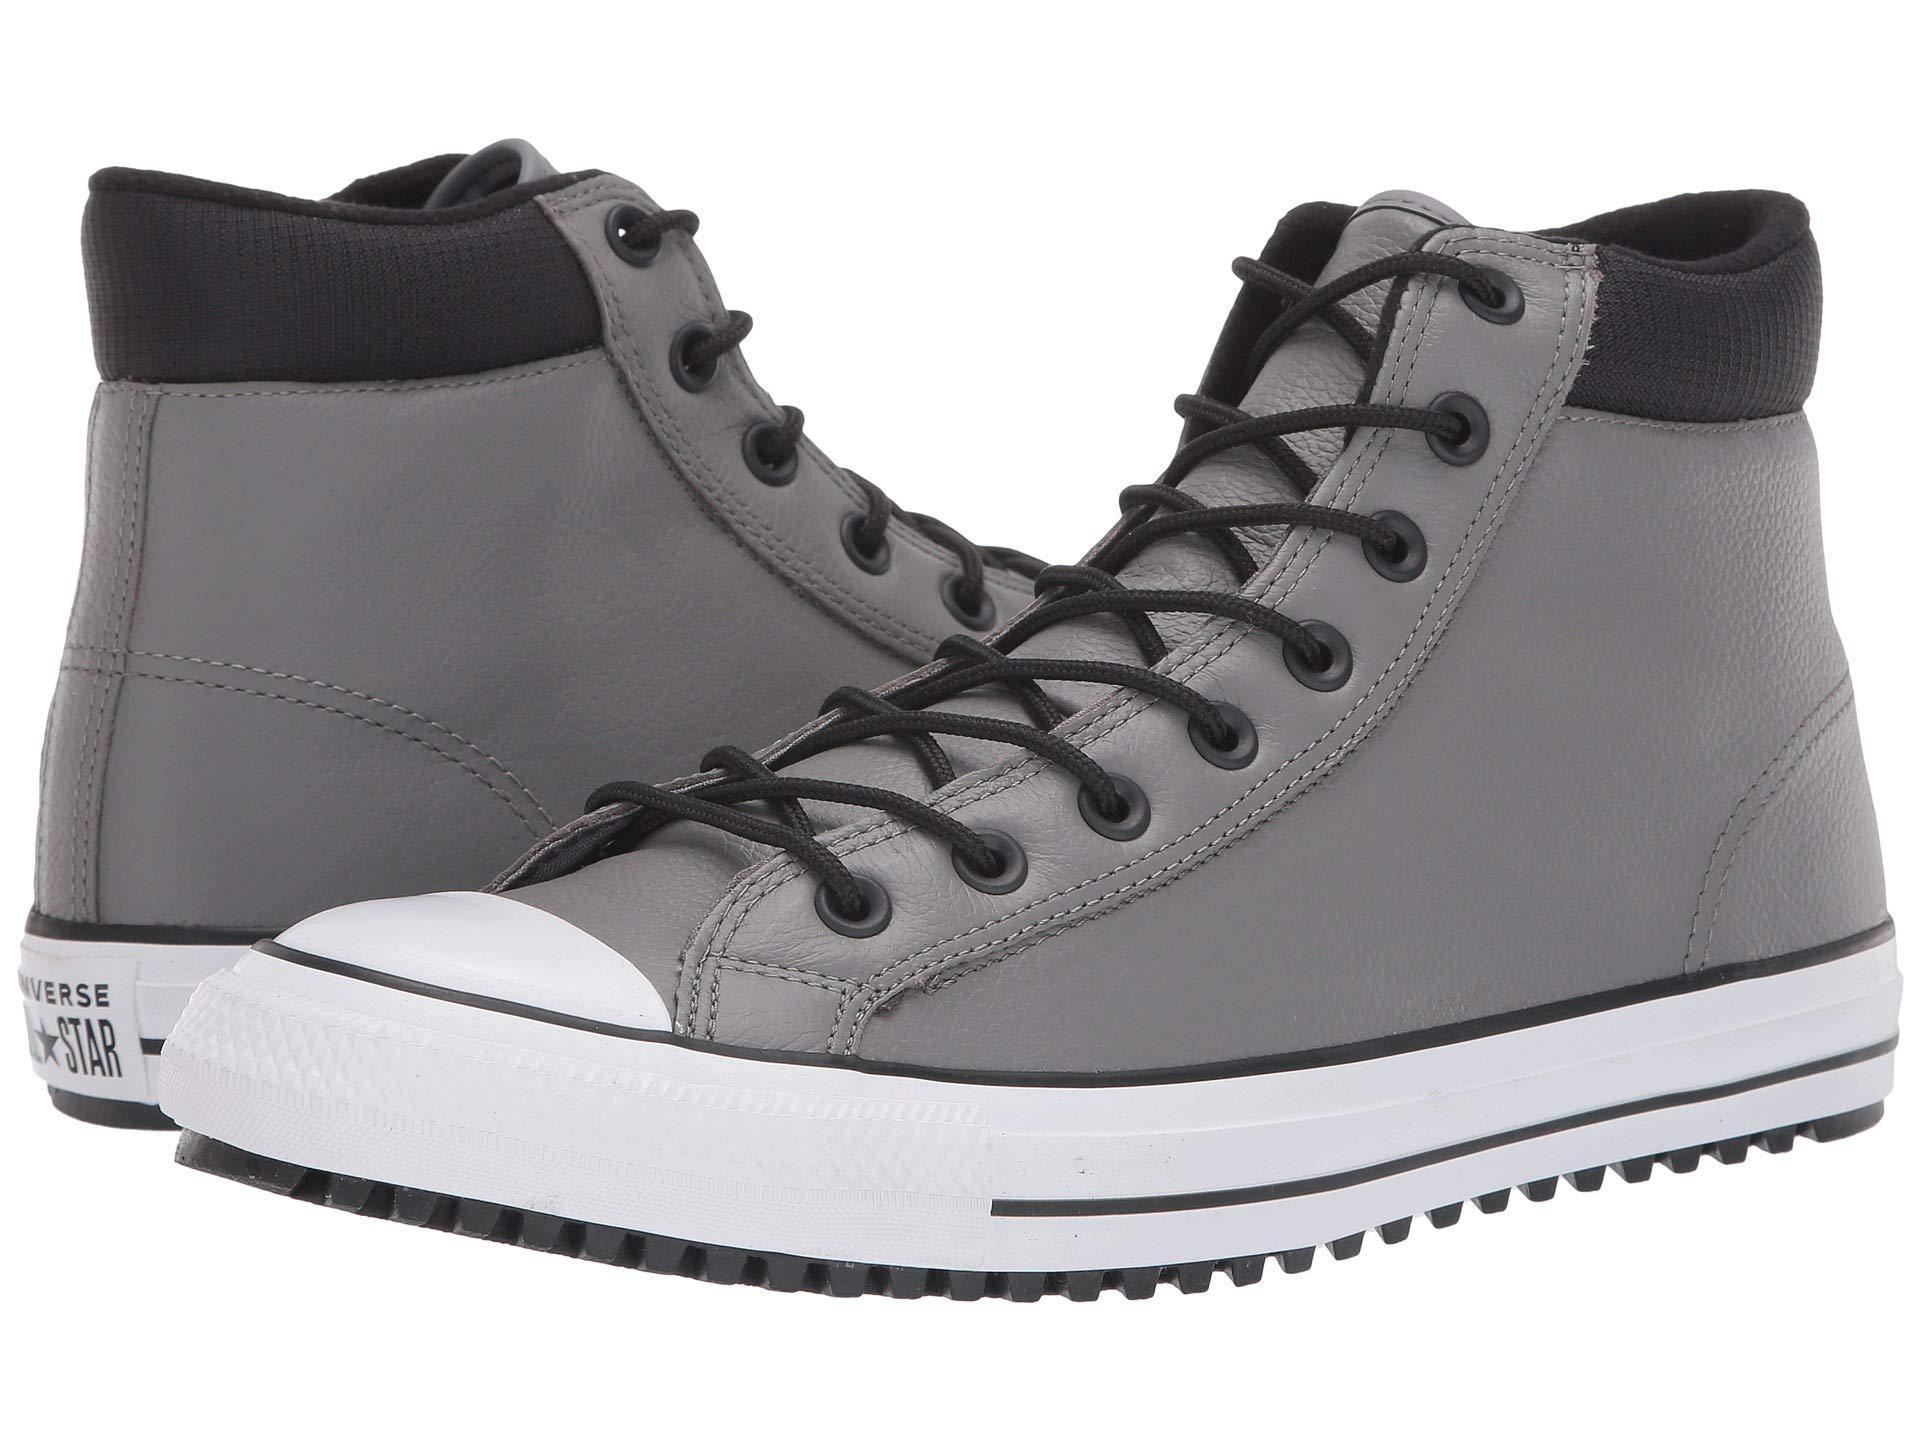 41461acddf16 ... denmark lyst converse chuck taylor all star padded collar boot hi black  21ca6 fad68